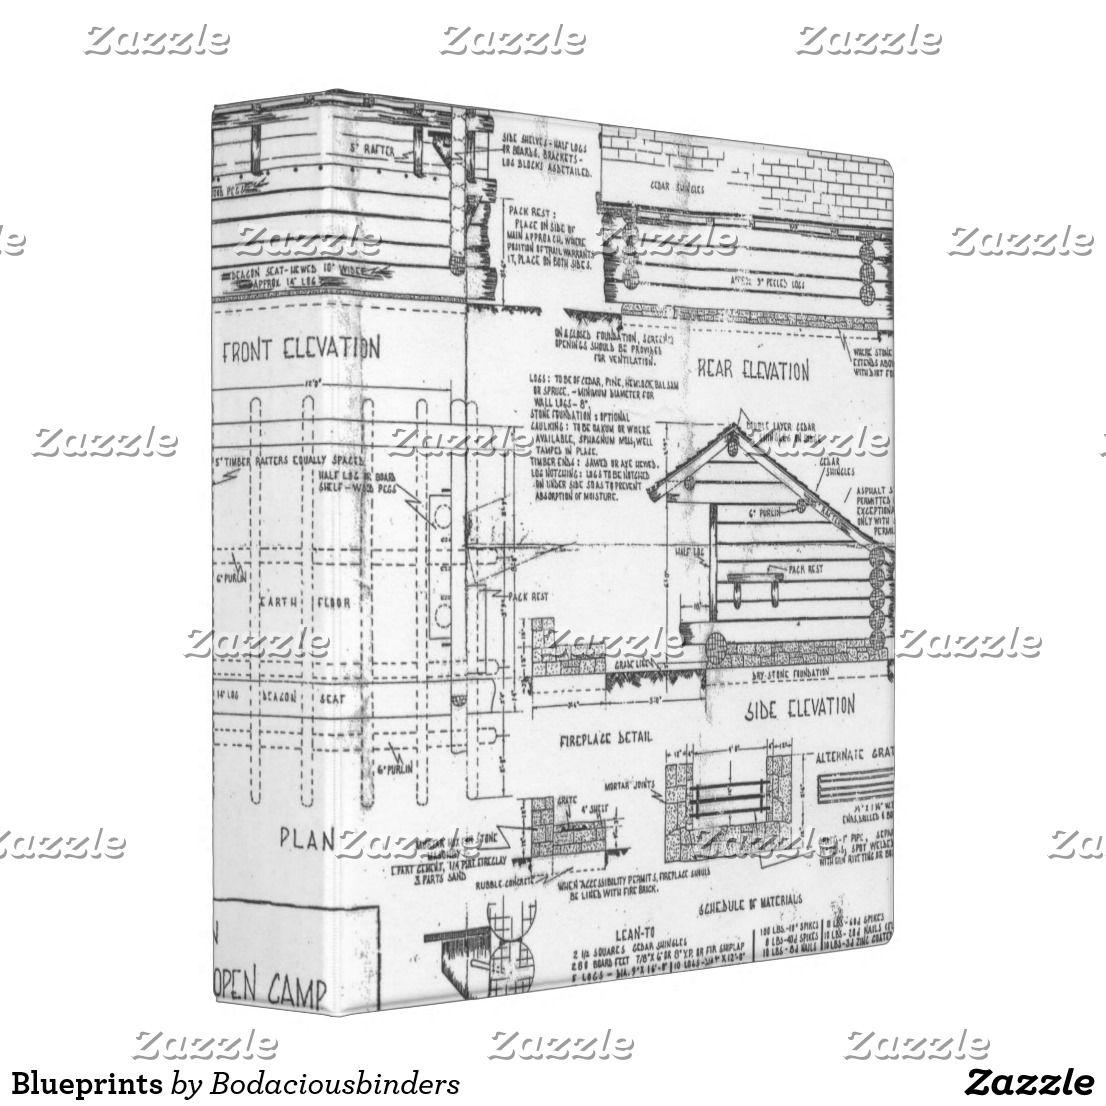 Blueprints 3 Ring Binder | Zazzle.com | Blueprints, Binder ...